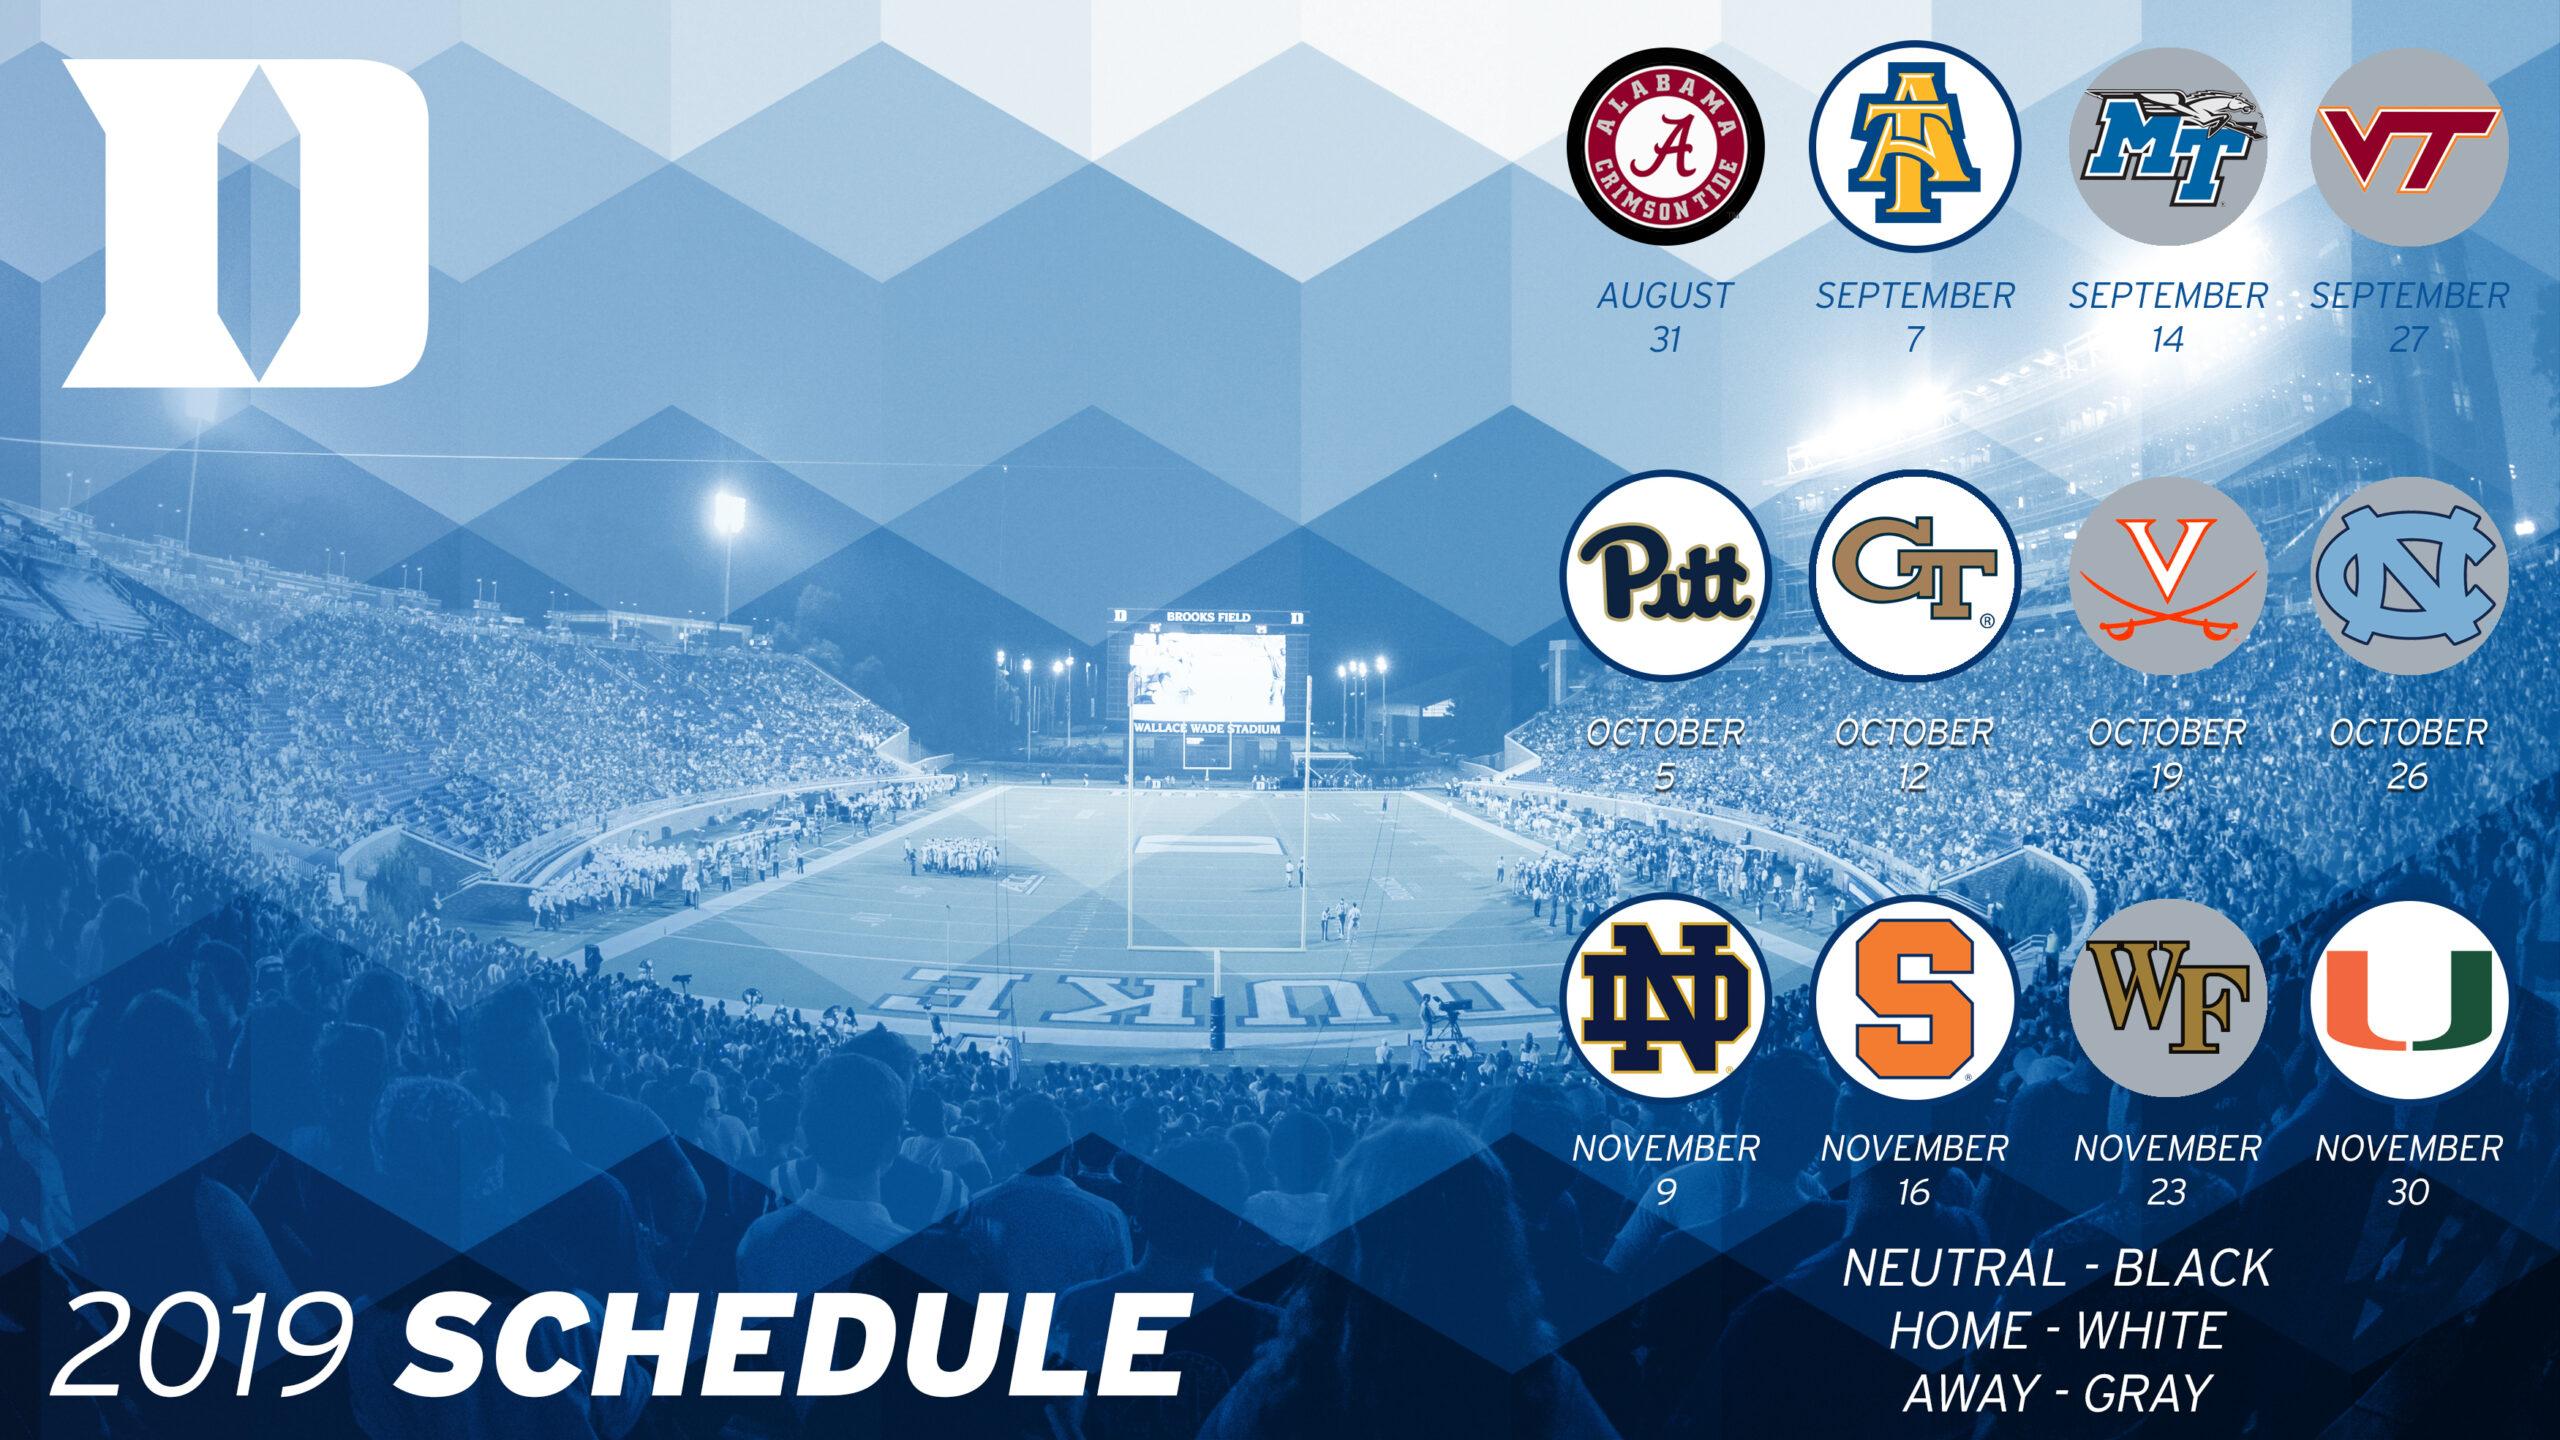 2019 Football Schedule Announced - Duke University